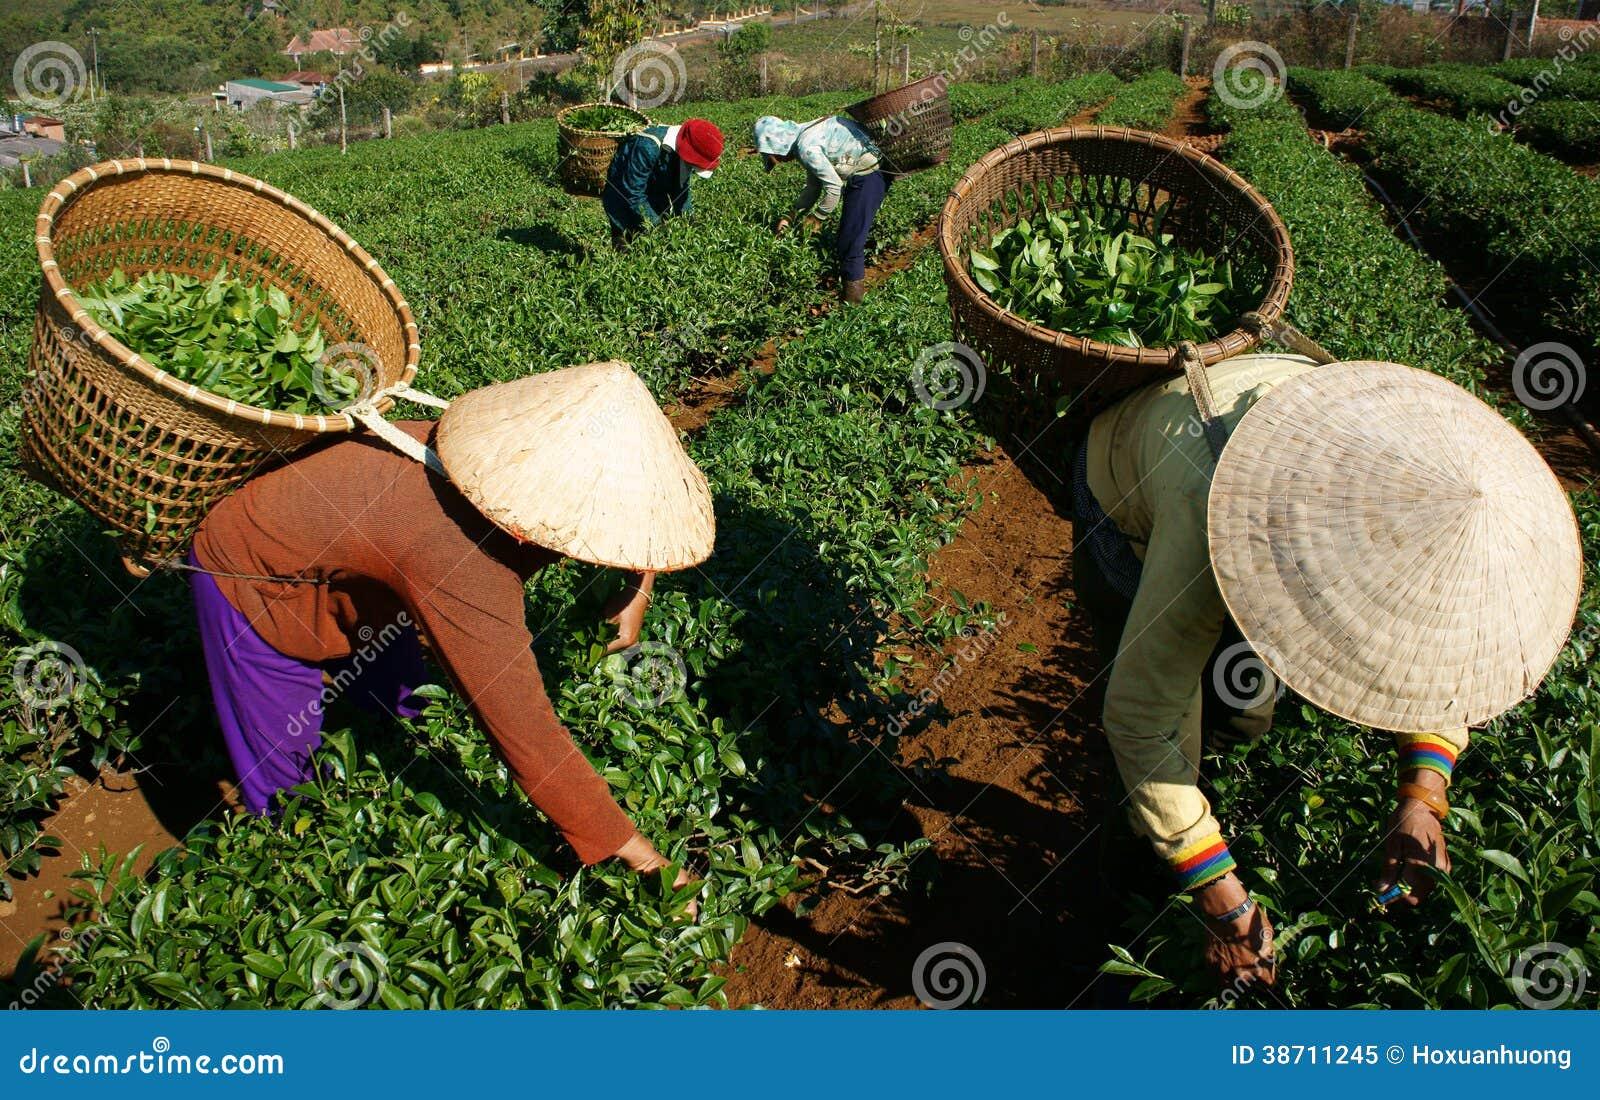 how to say tea in vietnamese